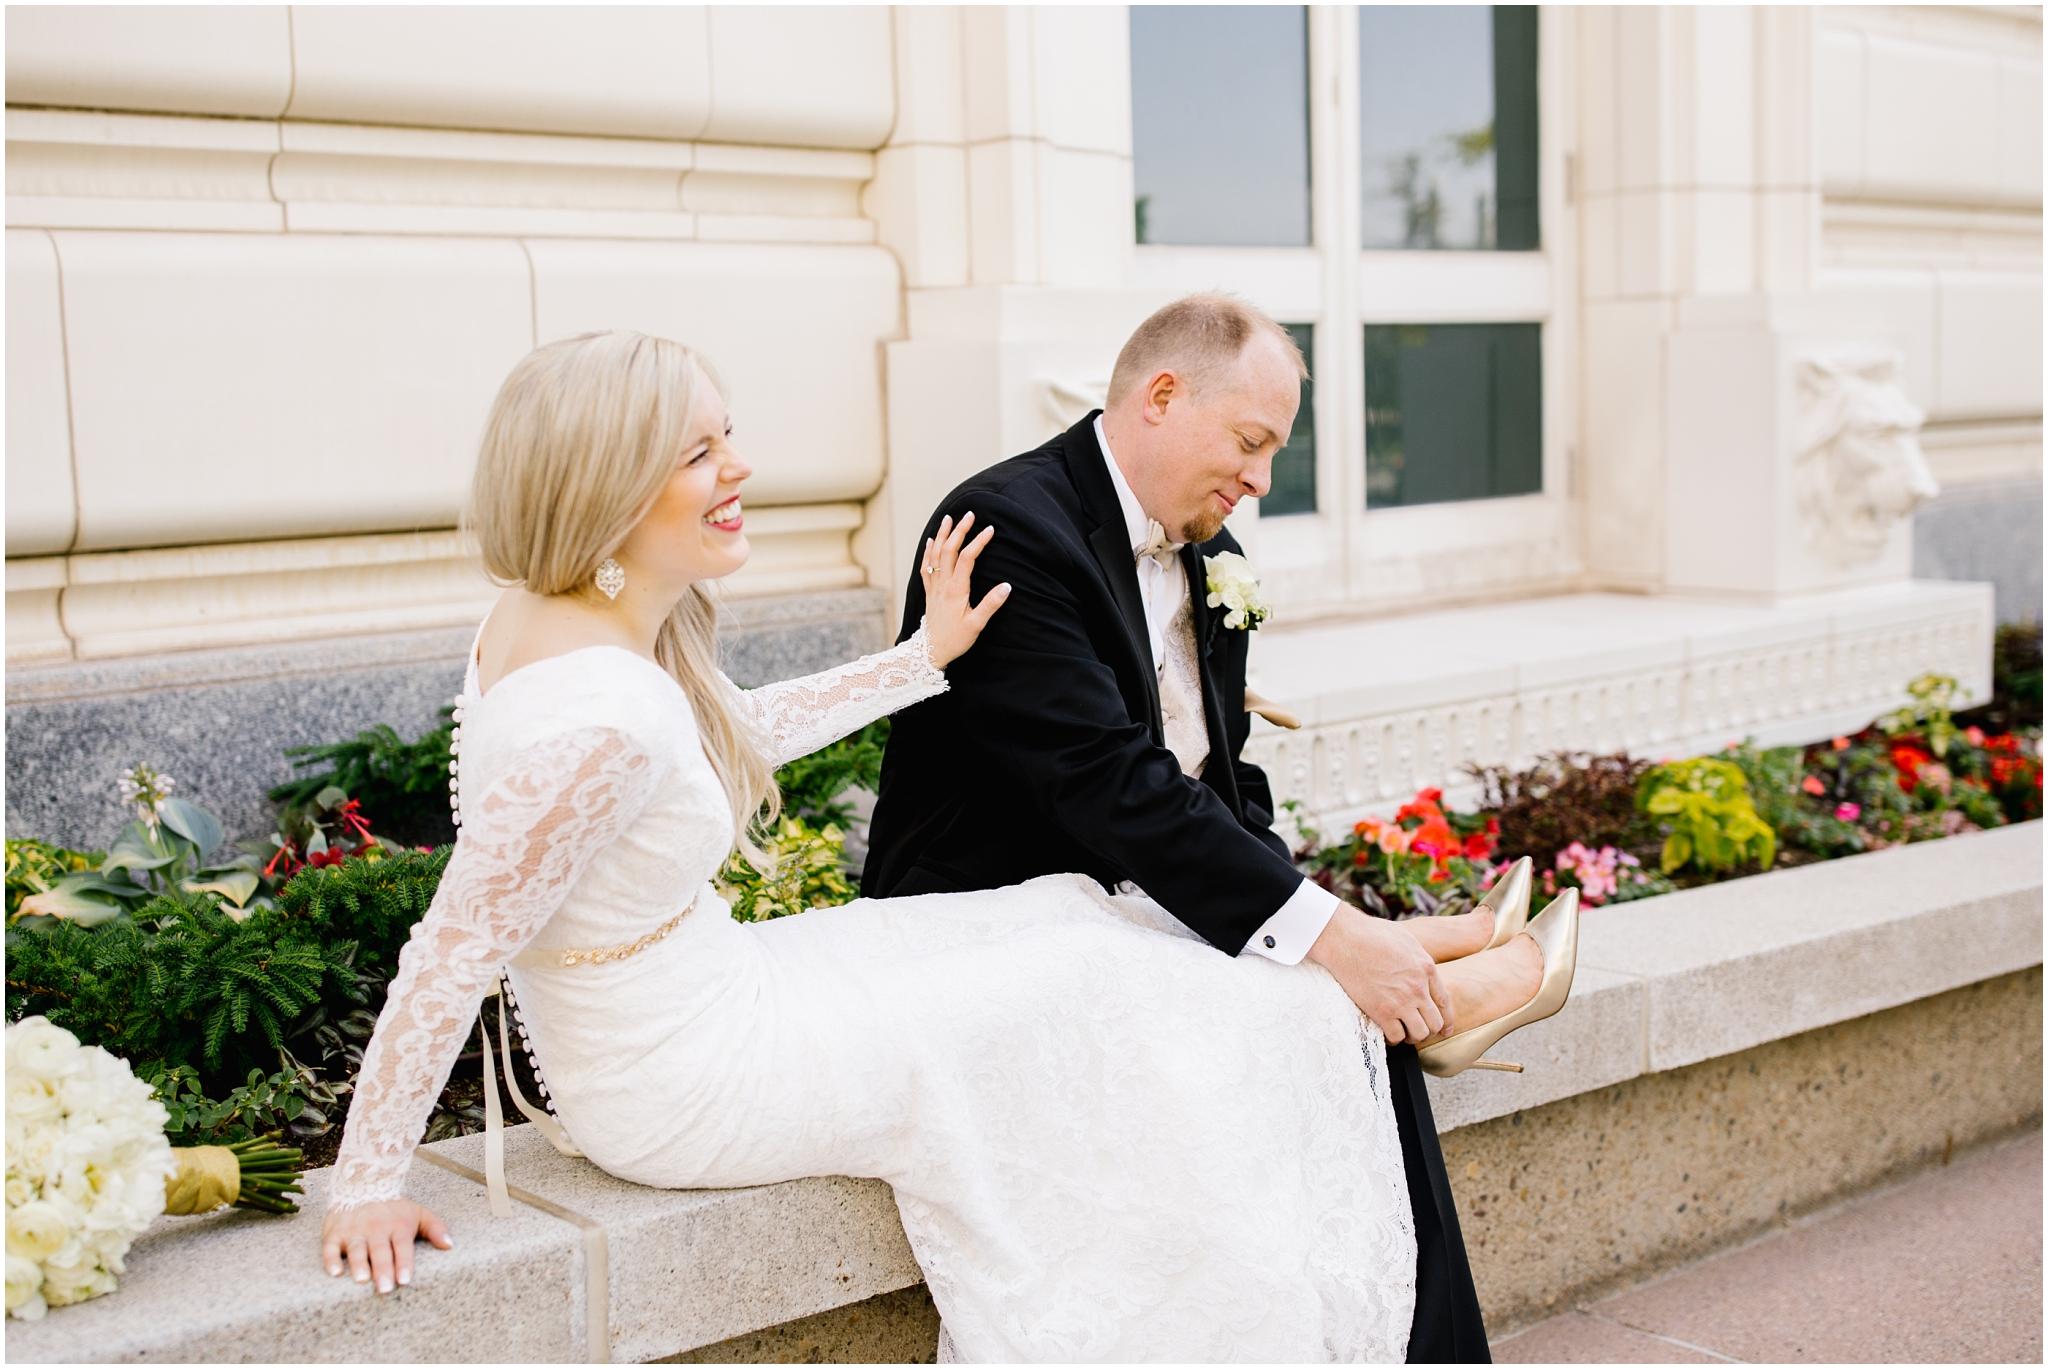 CherylandTyler-272_Lizzie-B-Imagery-Utah-Wedding-Photographer-Salt-Lake-City-Temple-Wells-Fargo-Building-Reception.jpg